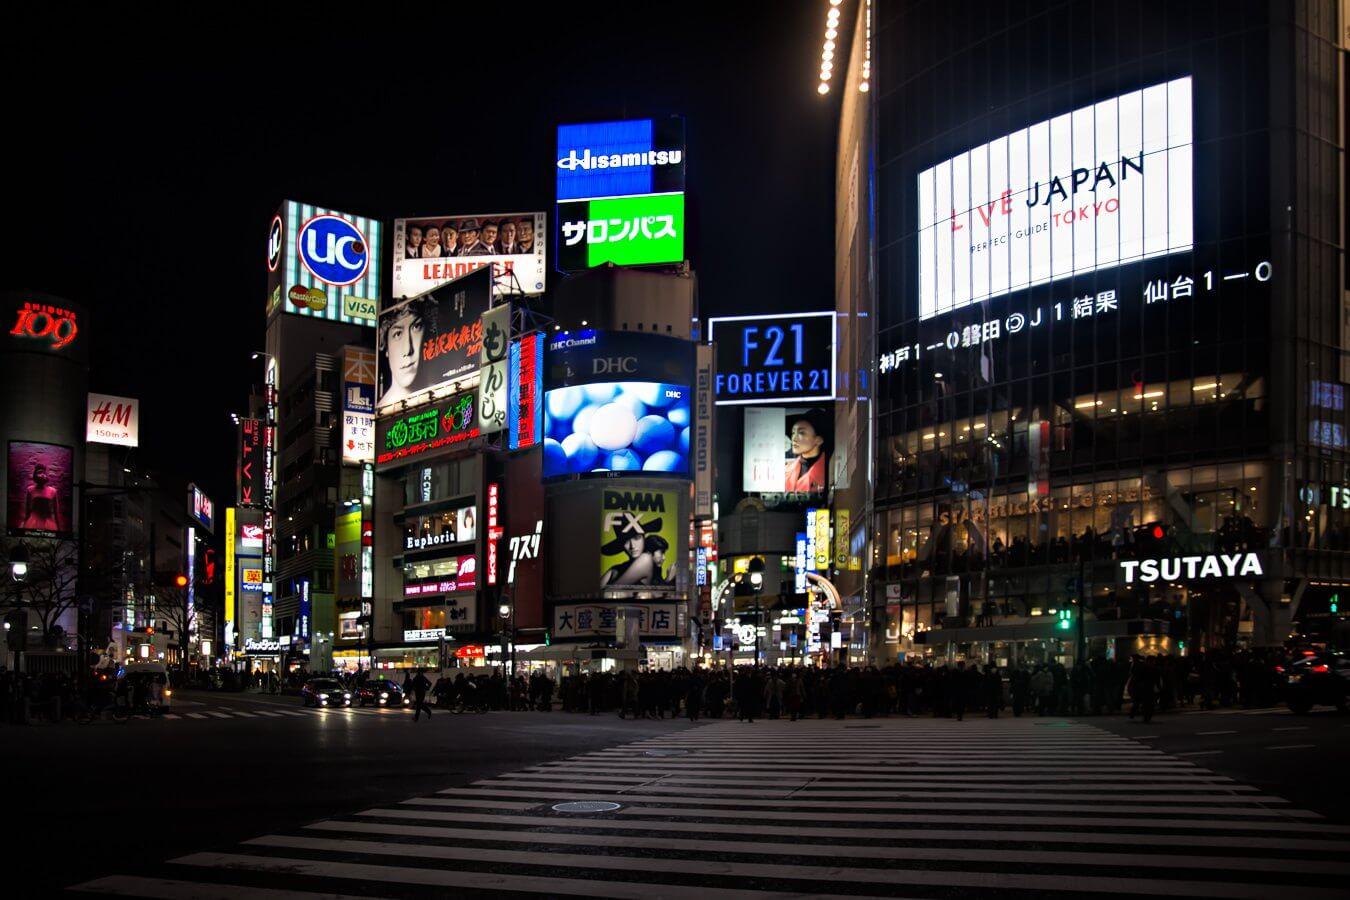 Shibuya Crossing, Tokyo, Japan - Photo by Zdenek Sindelar of CuriousZed Photography